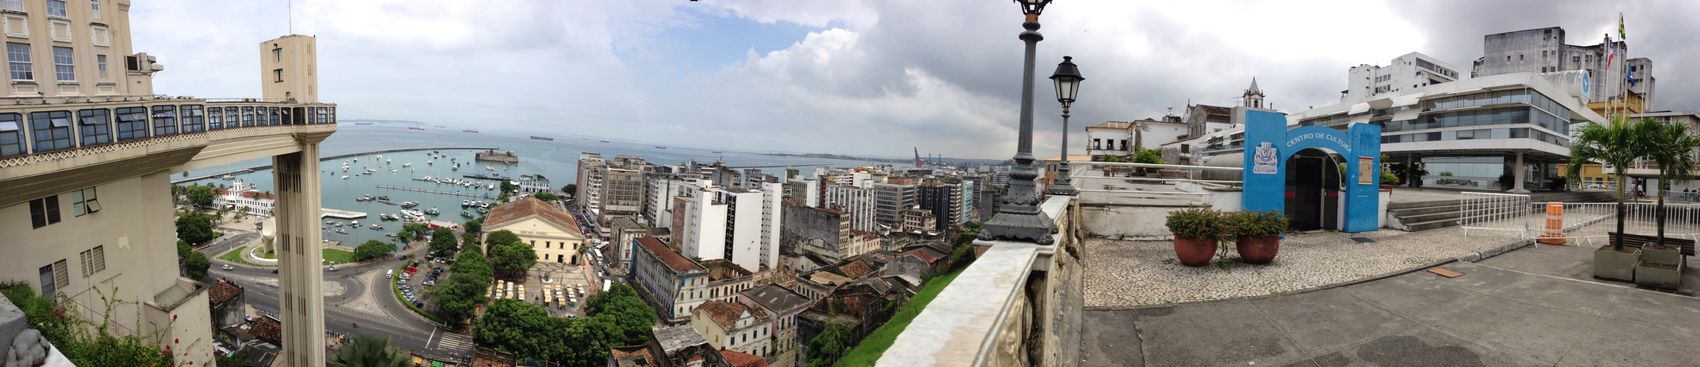 Salvador De Bahia Panoramashot Bahia/brazil